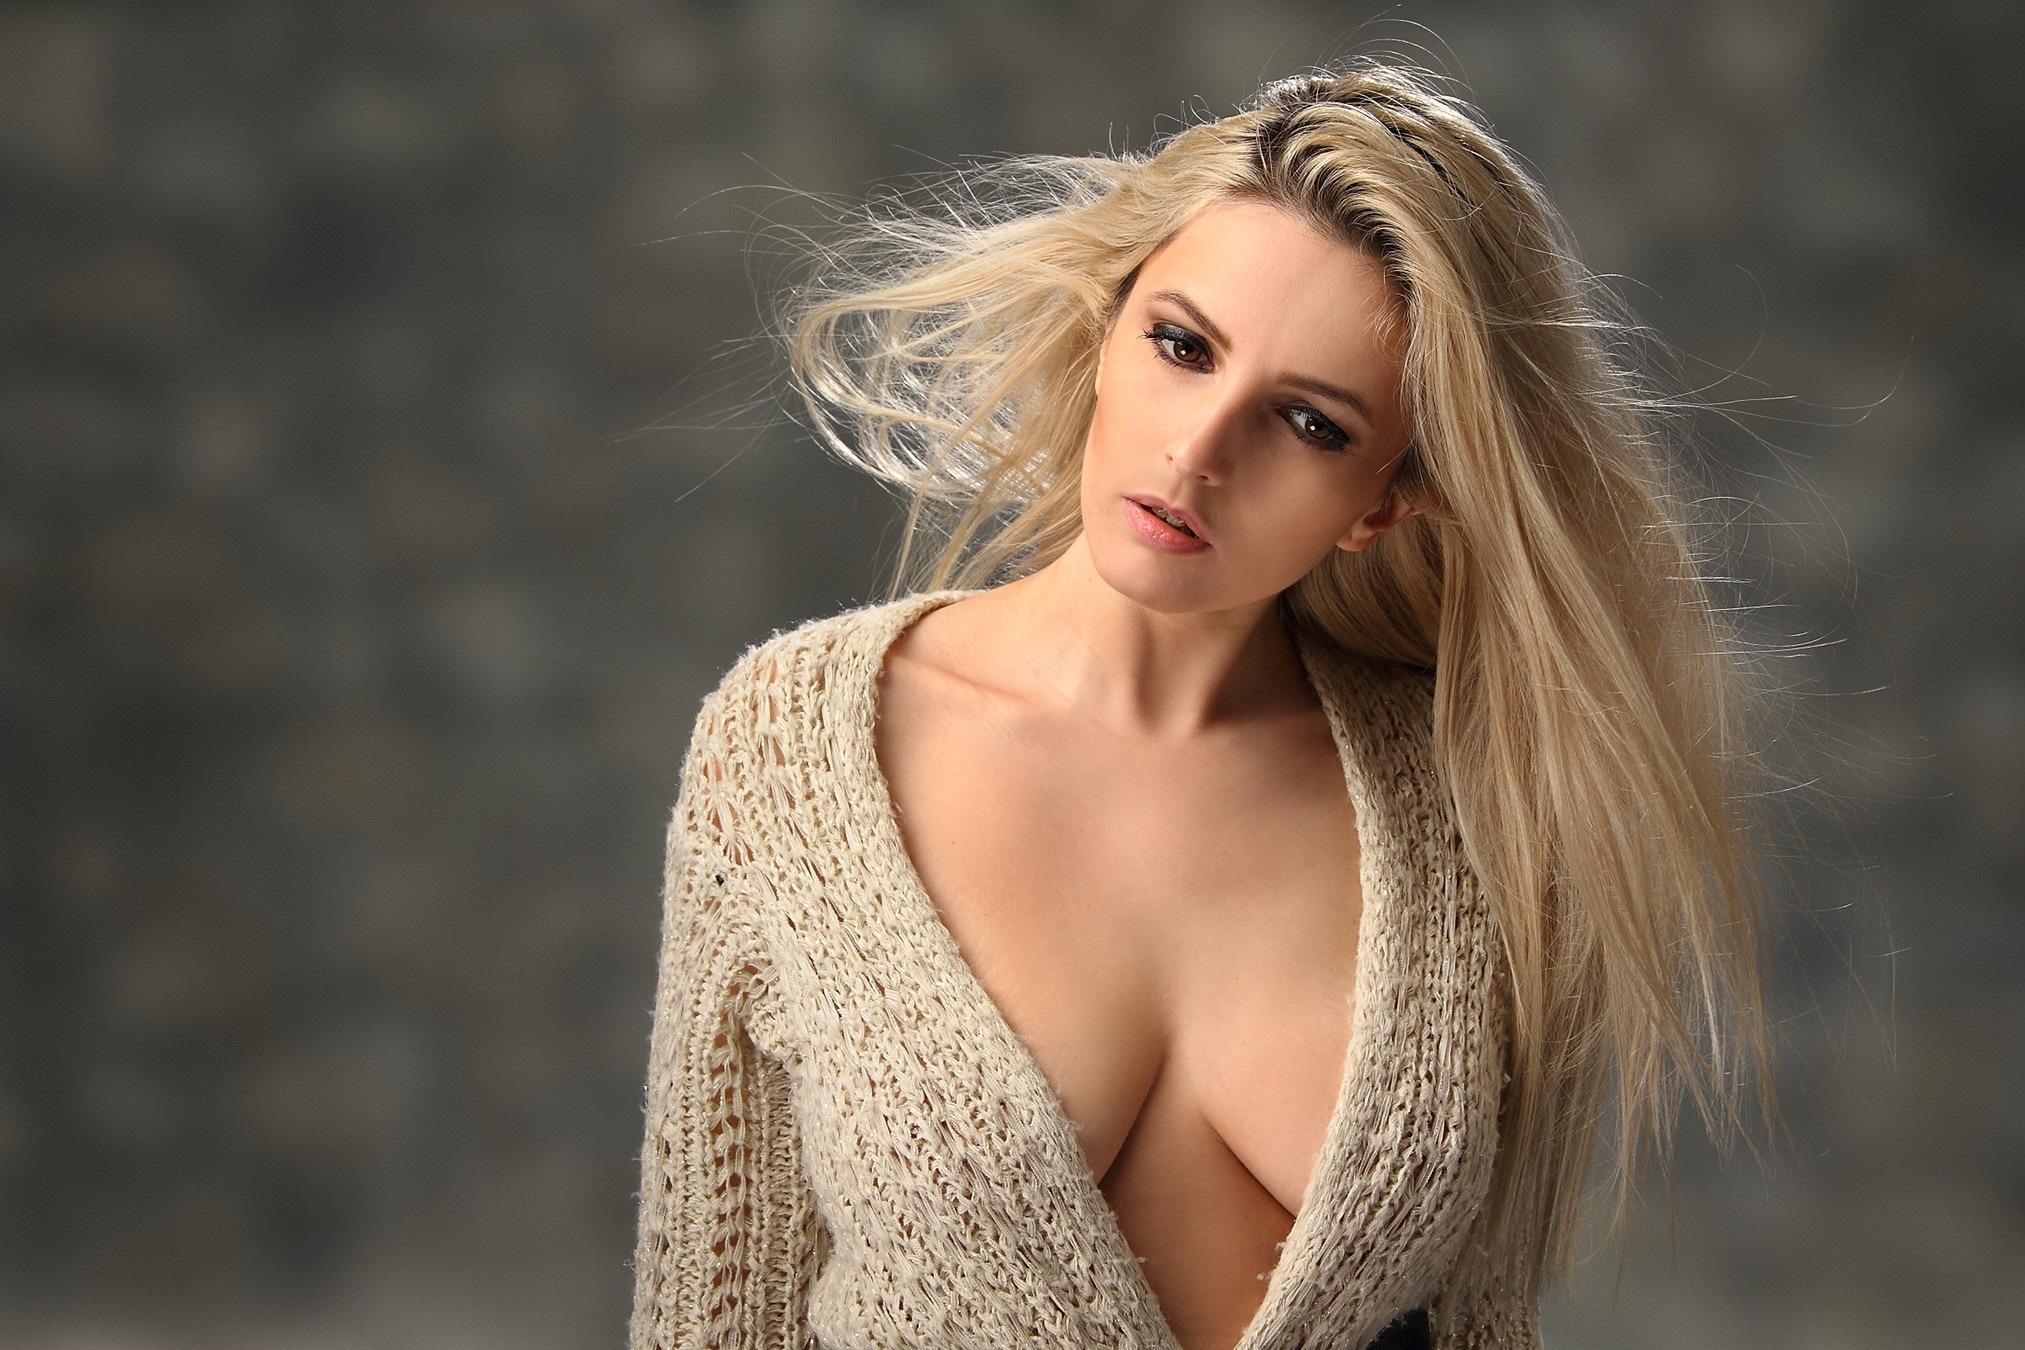 Portrait of a beautiful blonde woman by GuWu